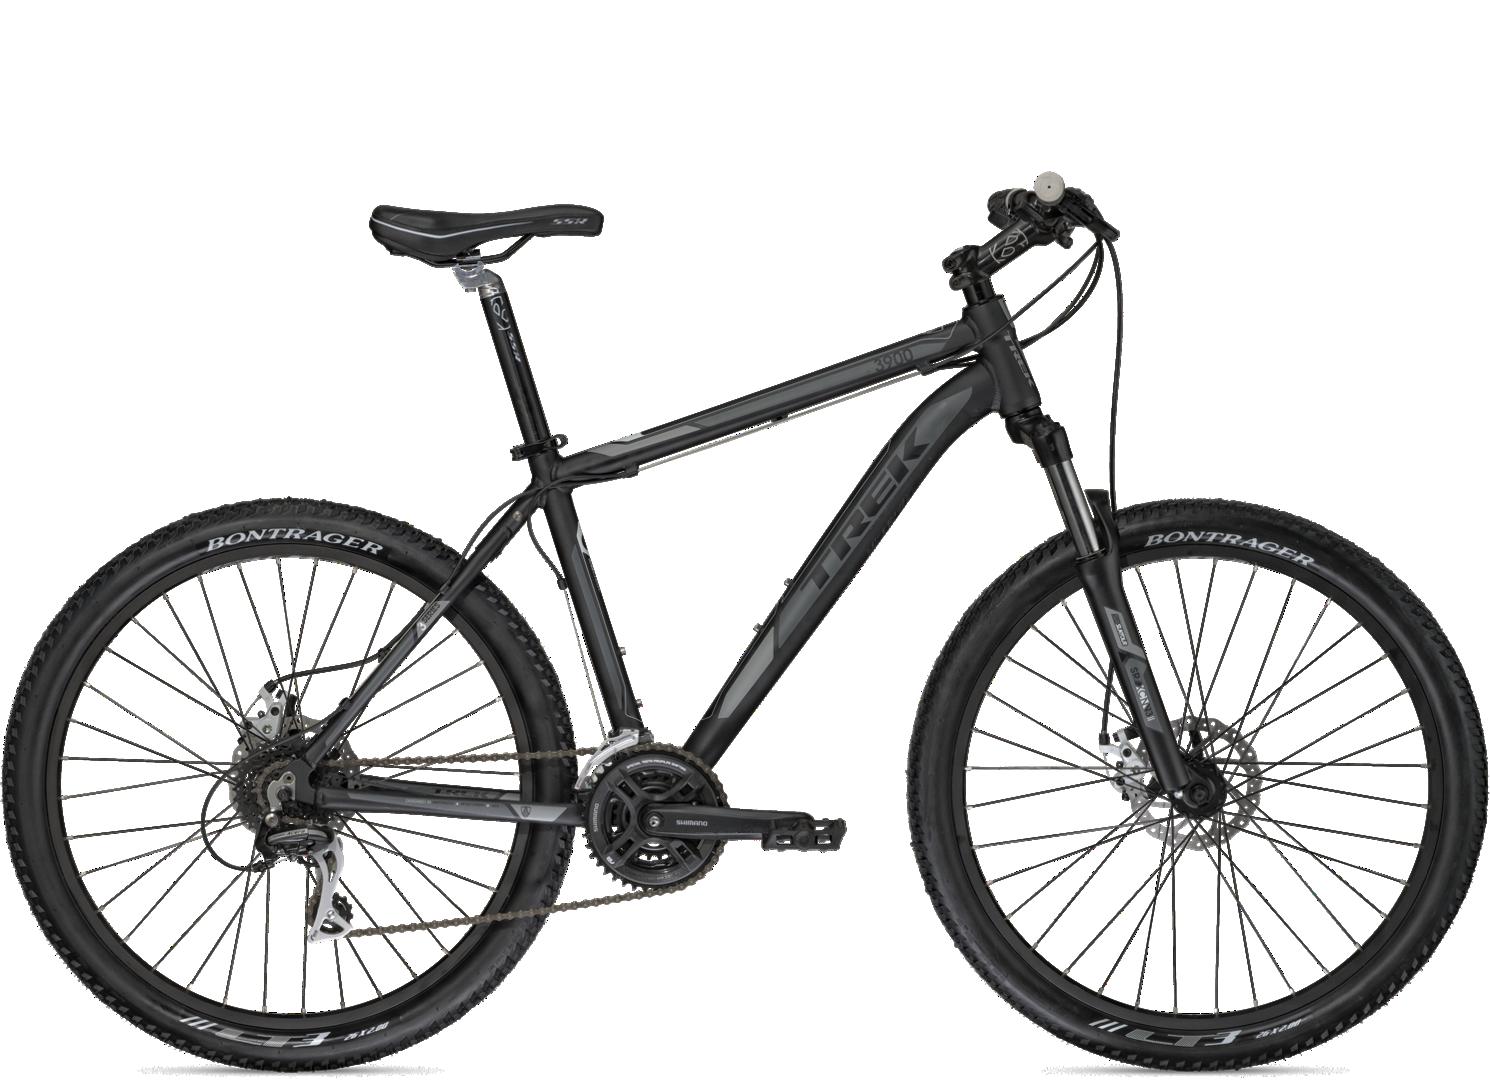 939d553ec3b 2012 3900 Disc - Bike Archive - Trek Bicycle